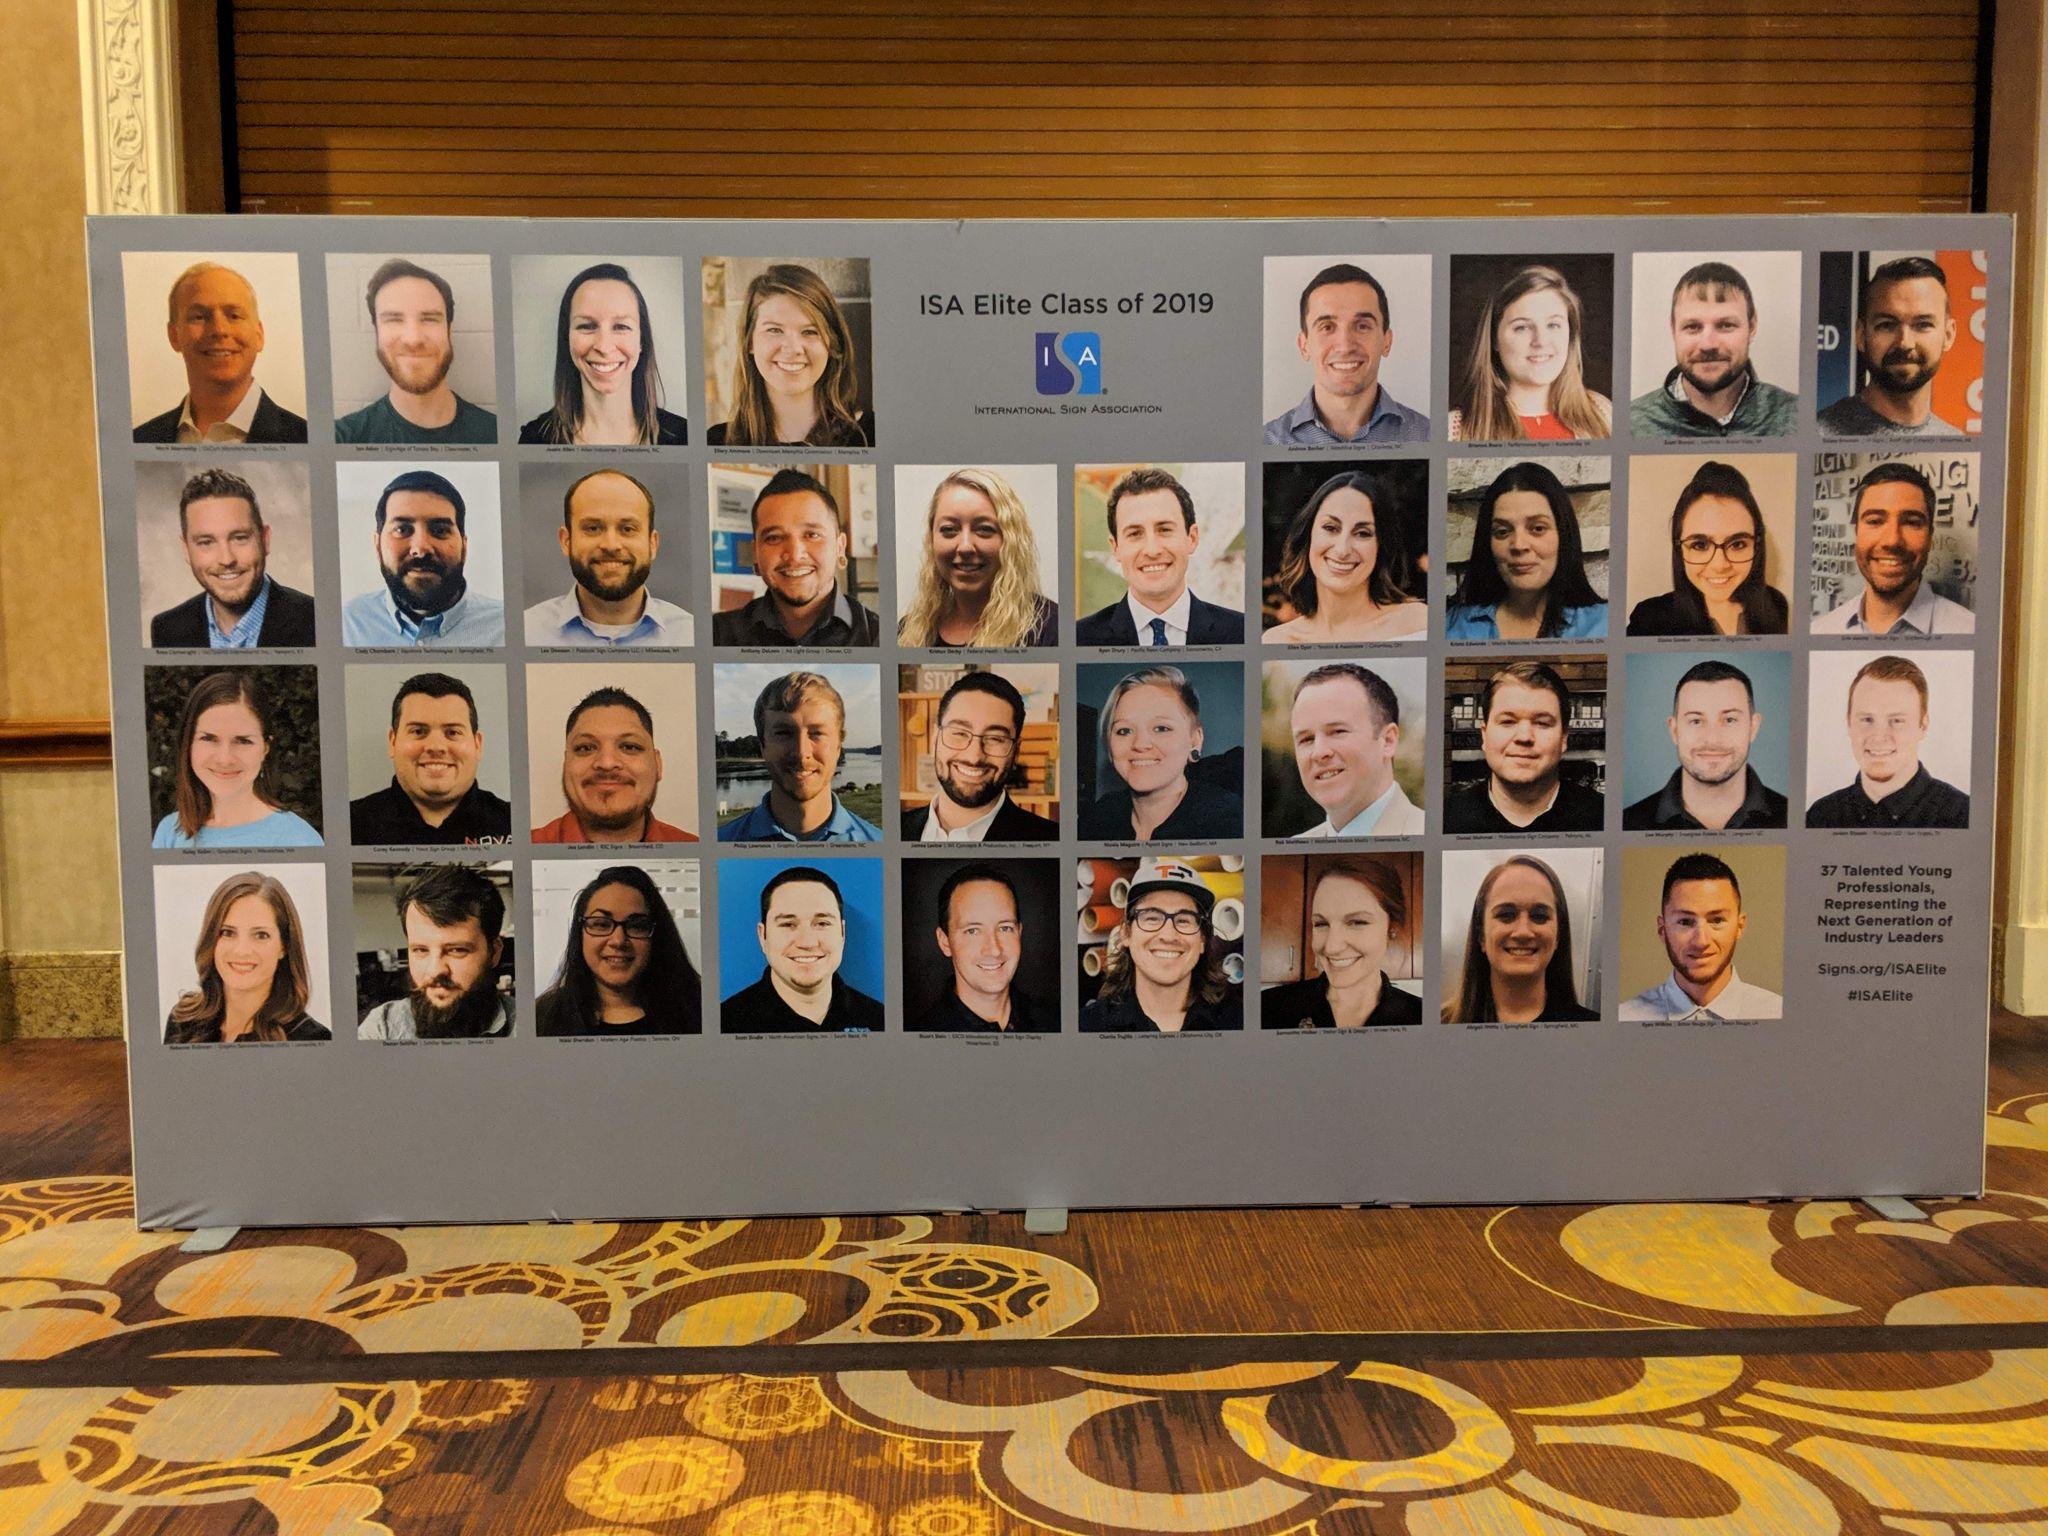 Photos from ISA expo 2019